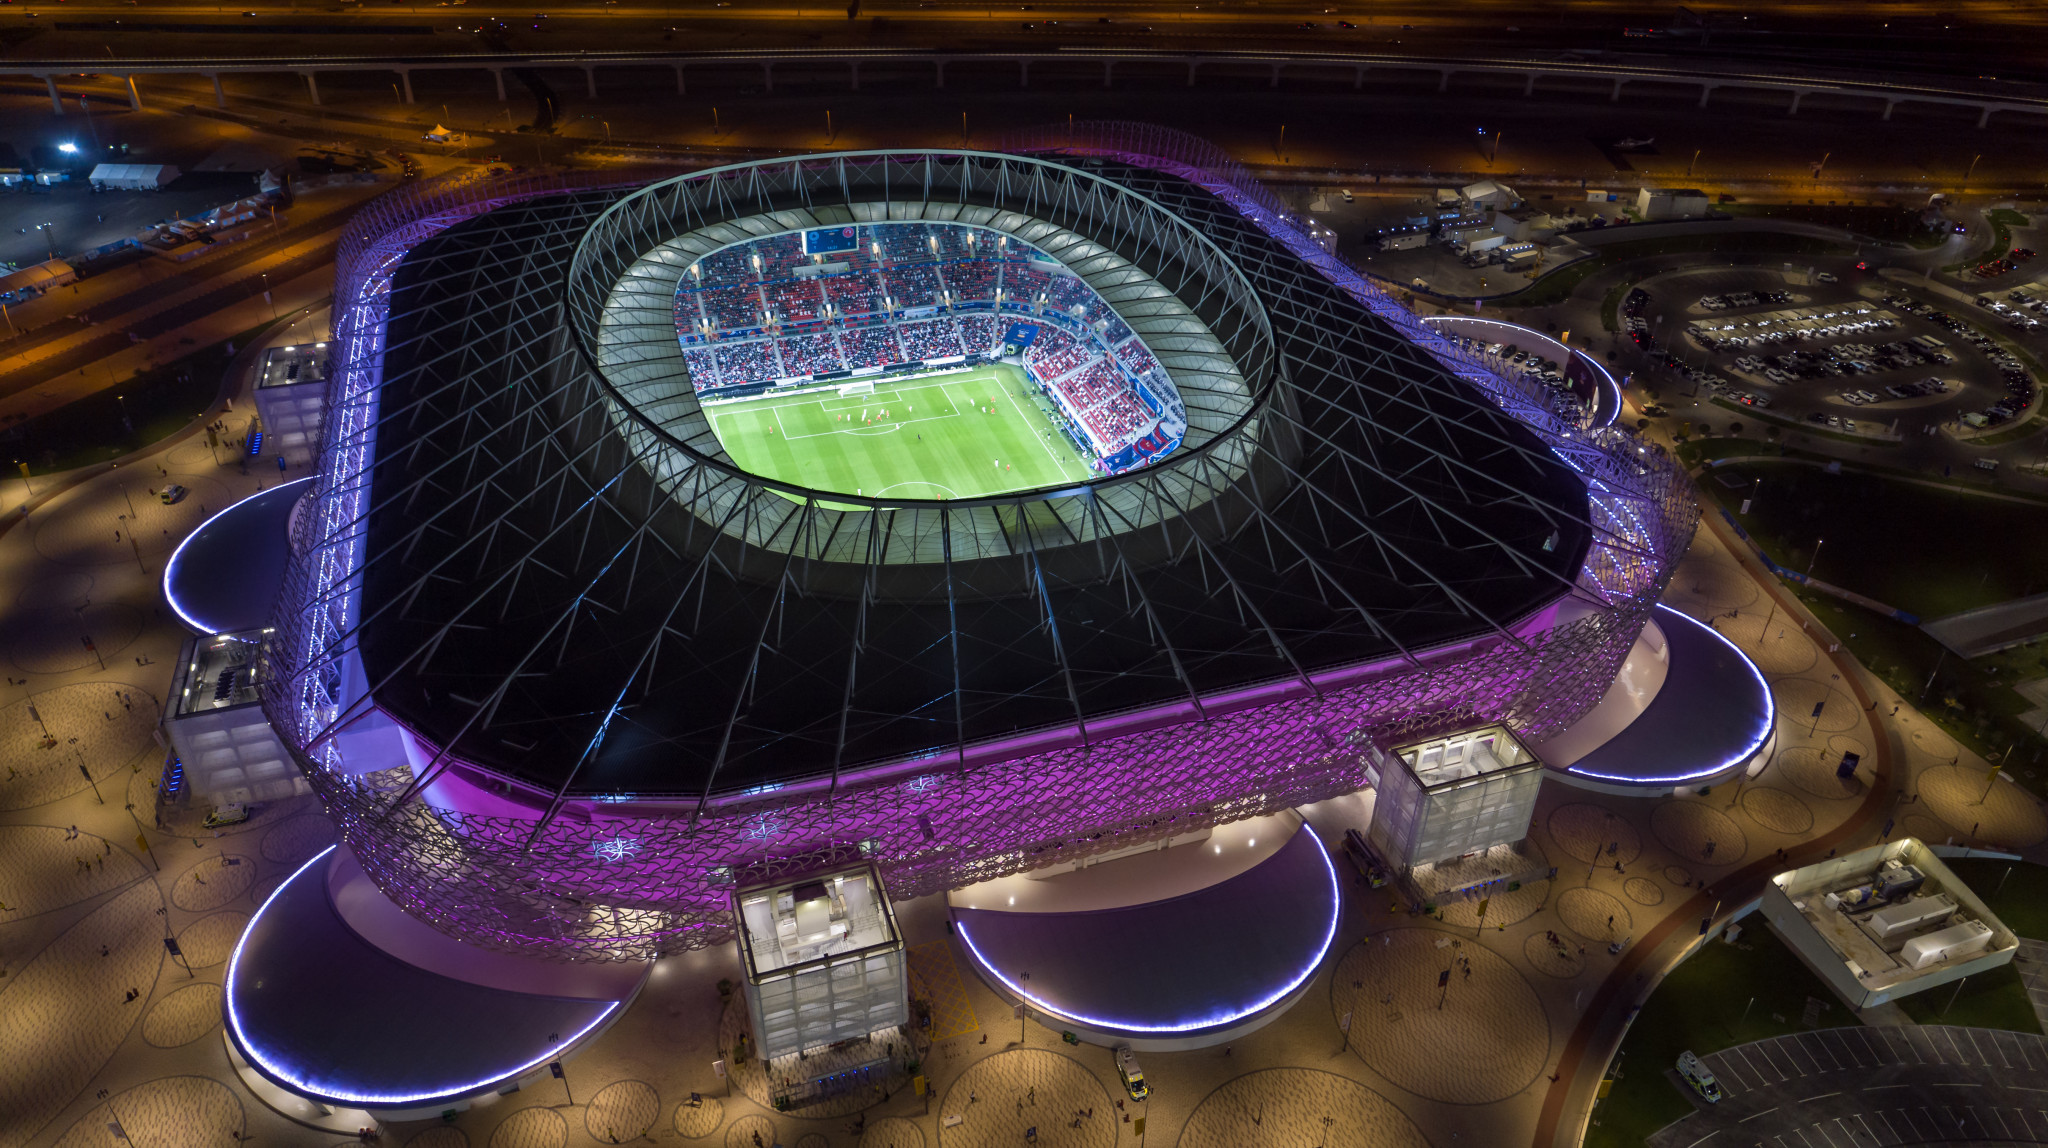 Qatar 2022 organisers confident of full stadiums at FIFA World Cup despite COVID threat